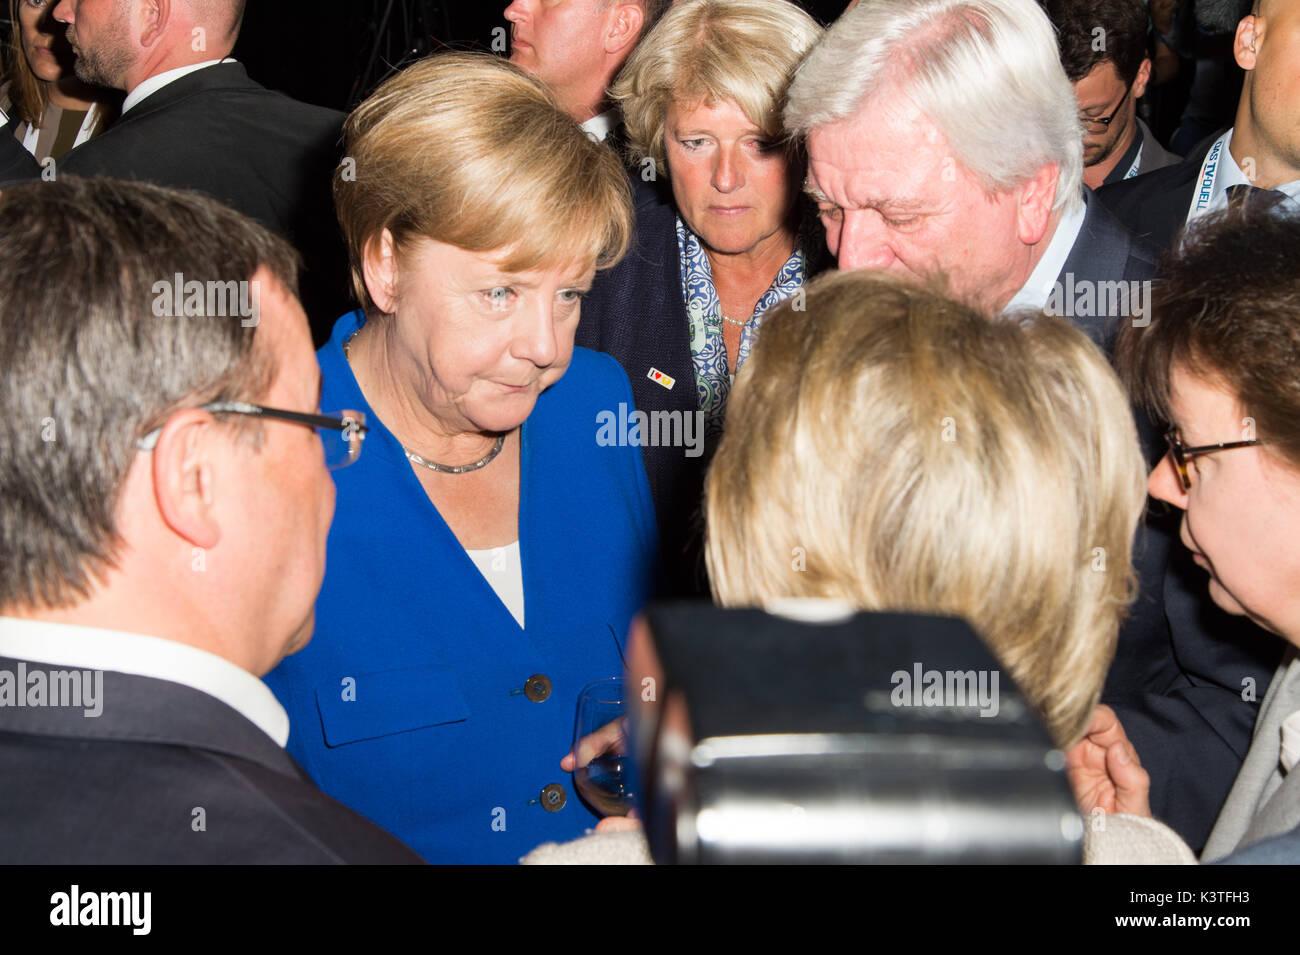 Berlin, Germany. 03rd Sep, 2017. Dr. Angela Merkel (M), happy after TV - election - duel, with Volker Bouffier, Dr. Angela Merkel - CDU vs. Martin Schulz - SPD, GER, 03.09.2017, Foto: Uwe Koch/fotobasis.de Credit: Uwe Koch/Alamy Live News - Stock Image